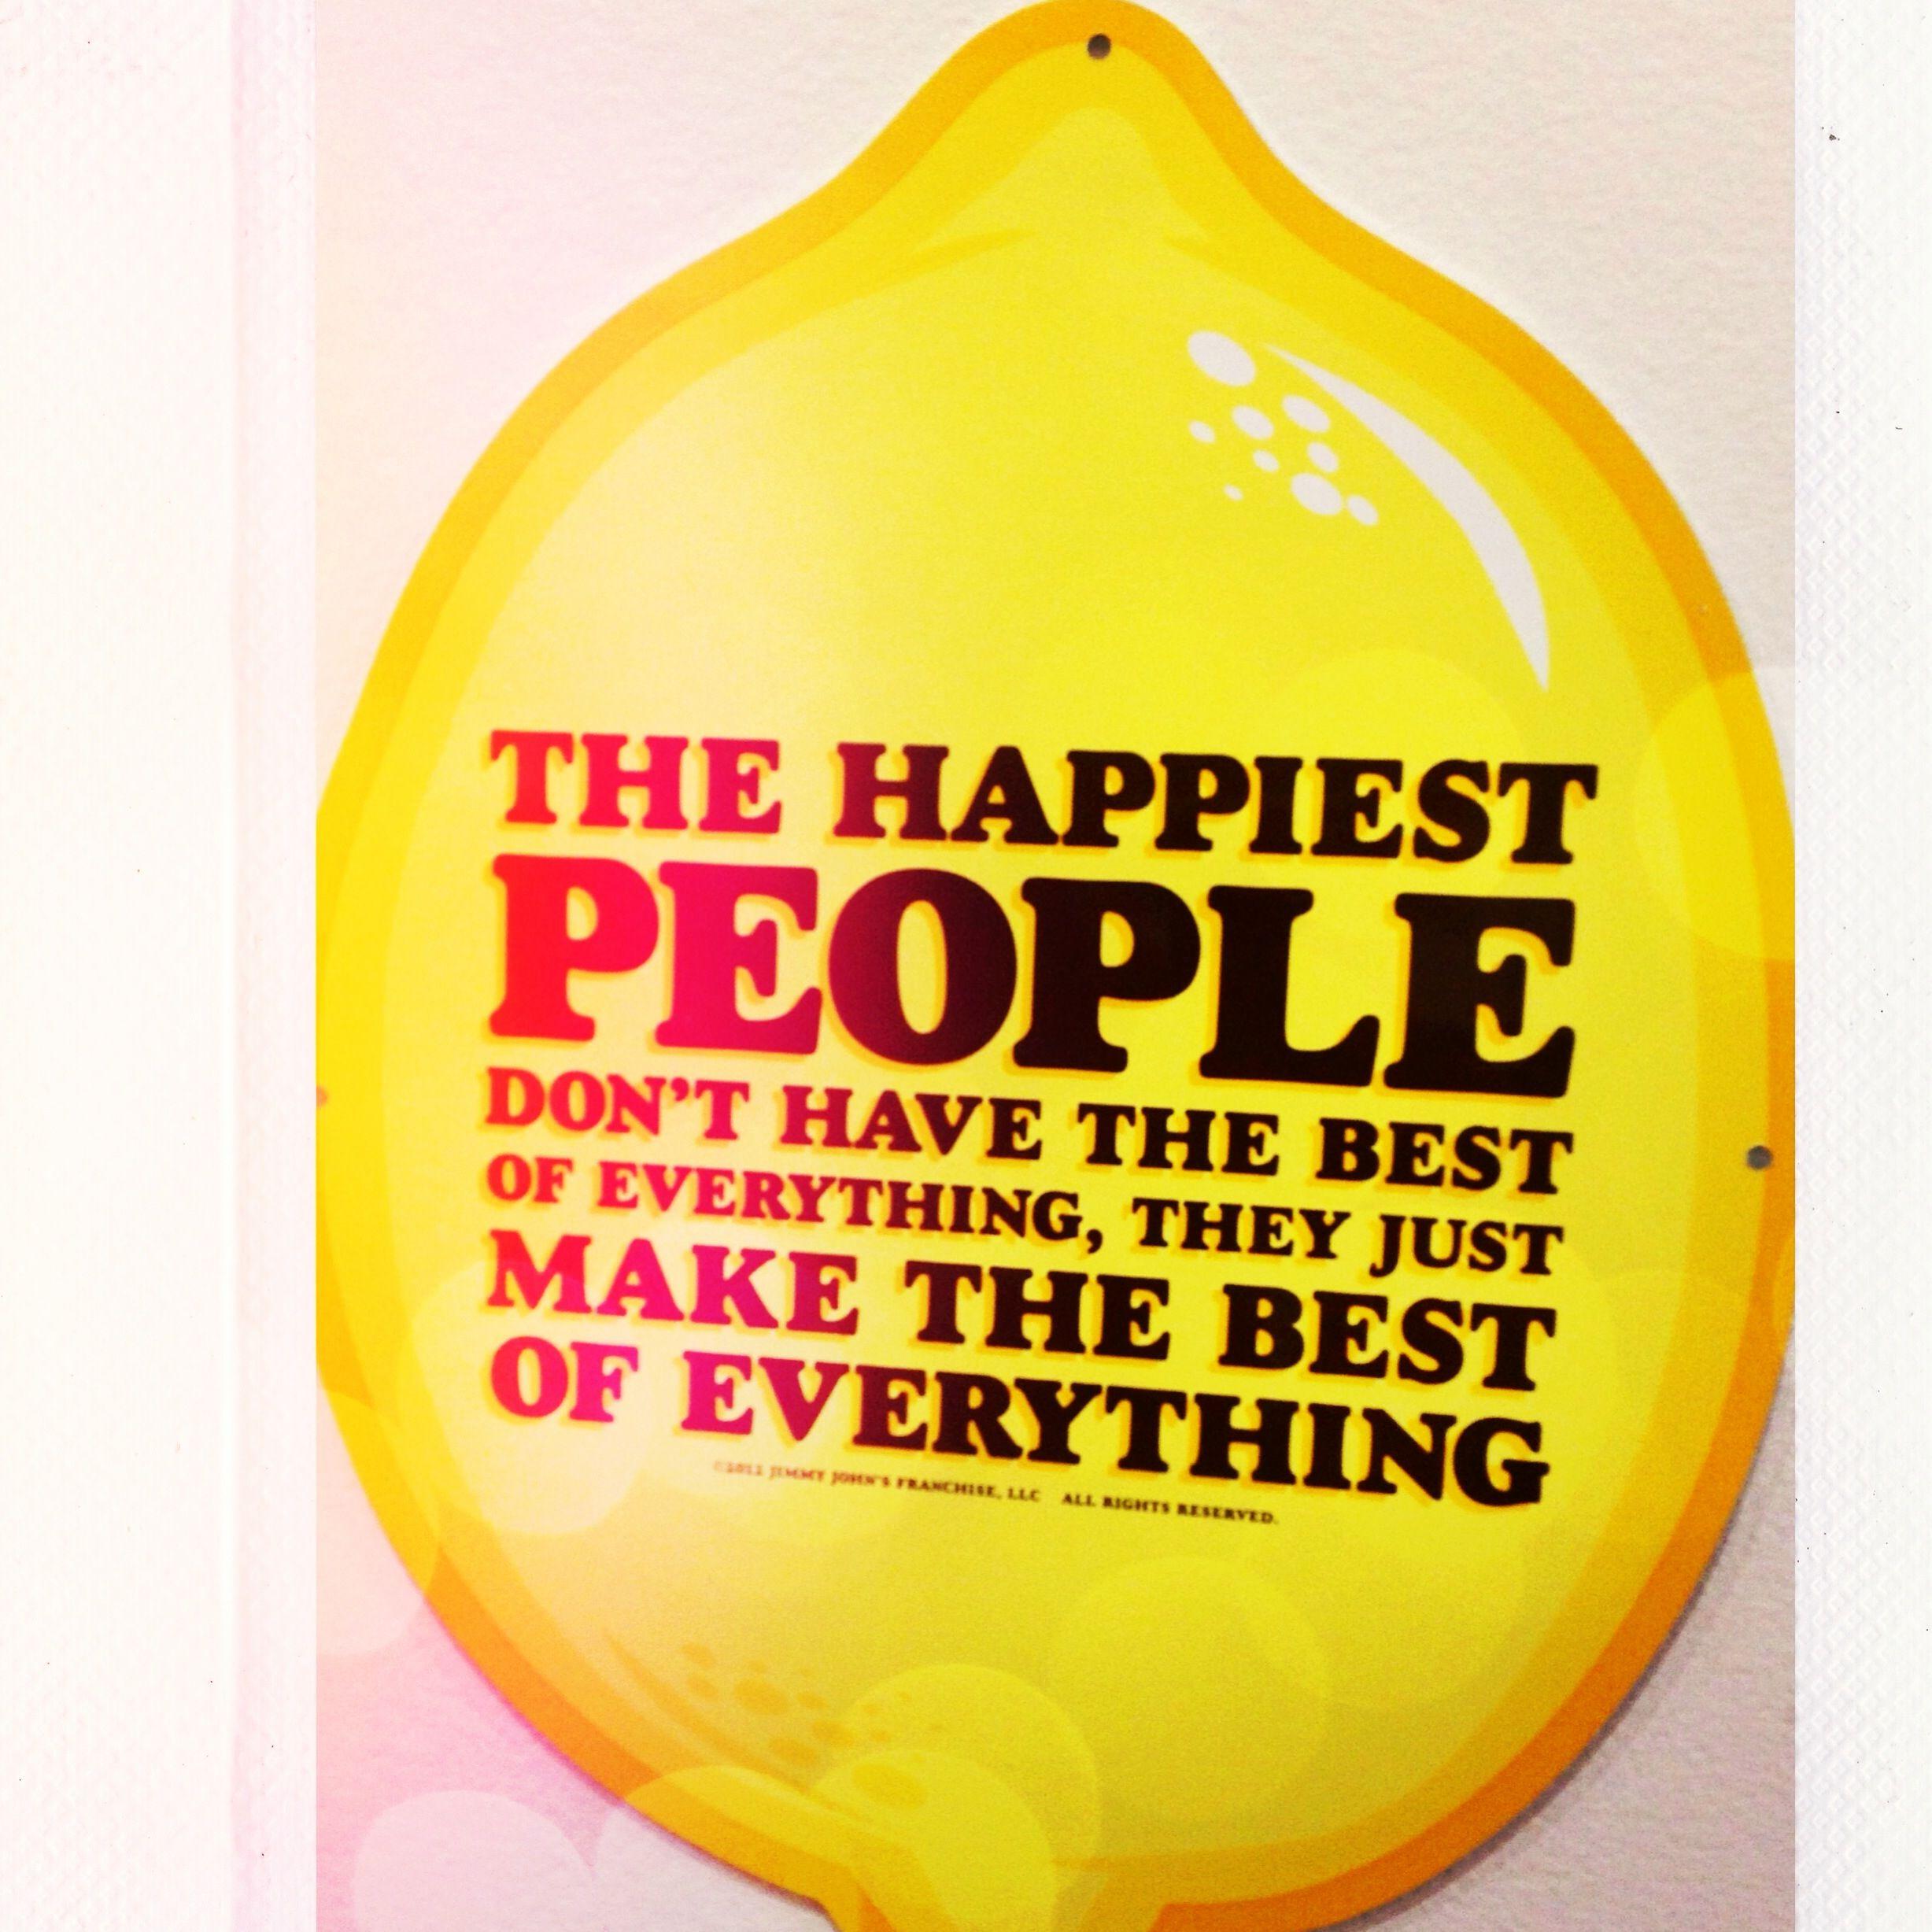 When life gives you lemons make lemonade Quotes Pinterest